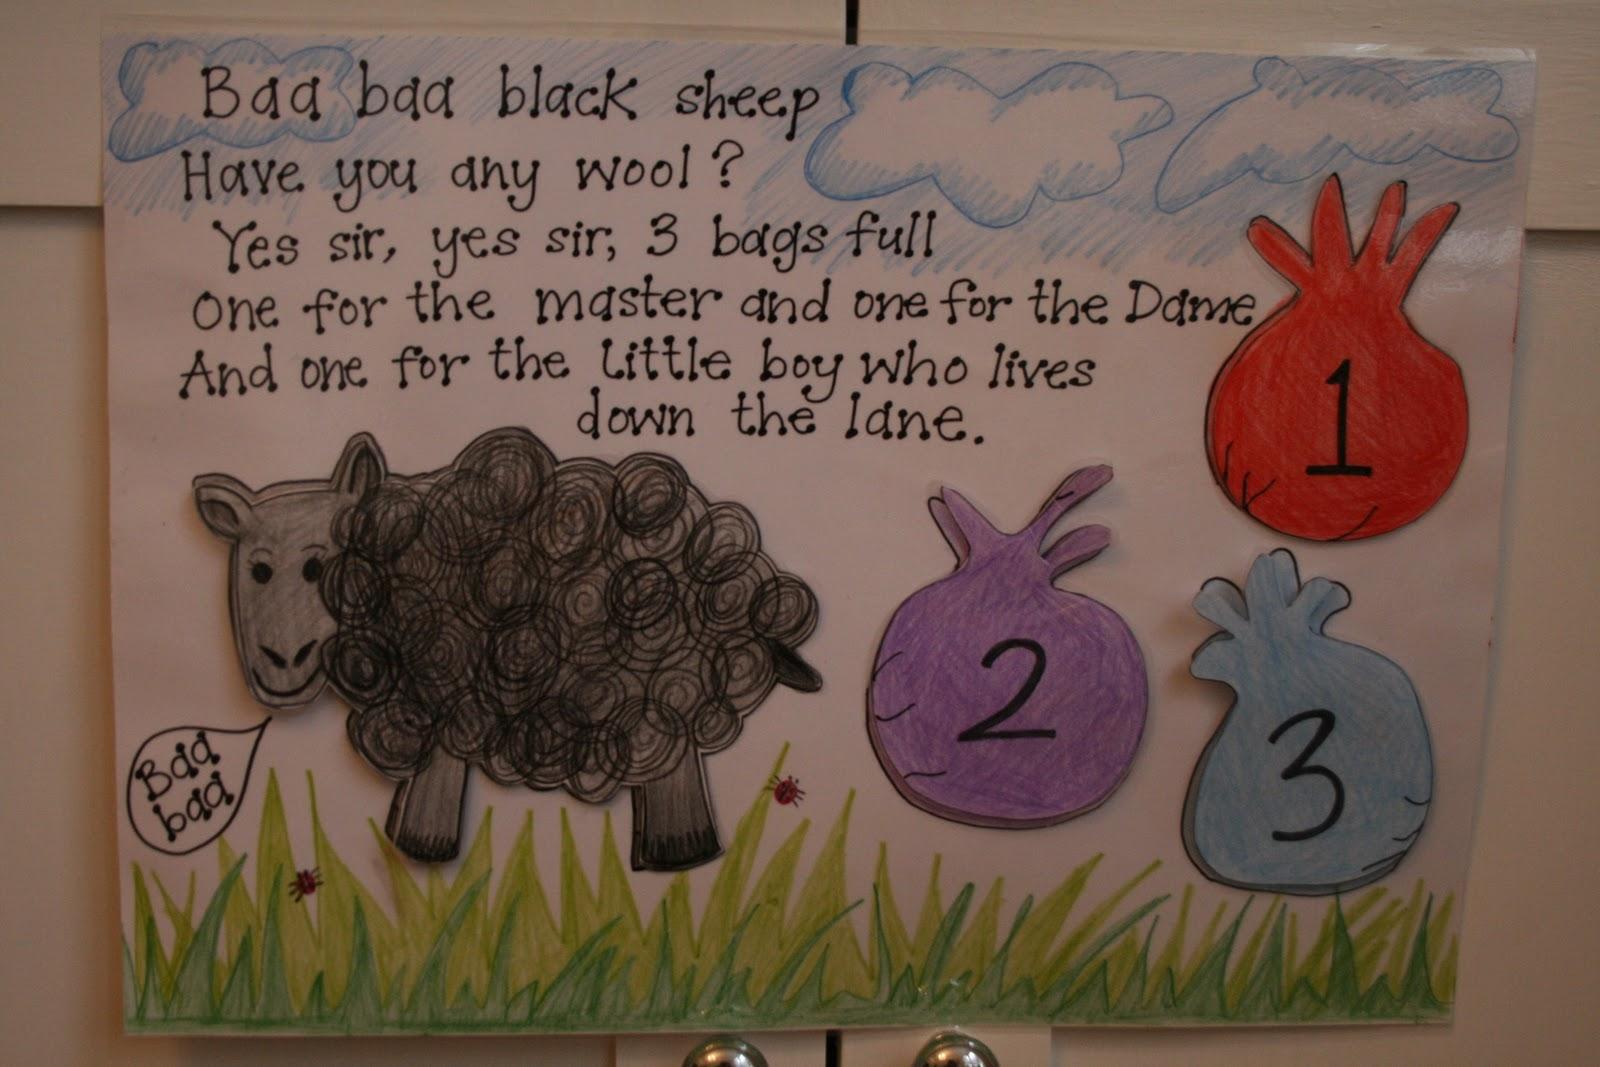 Baa Baa Black Sheep Racist Lyrics Rewritten Are We